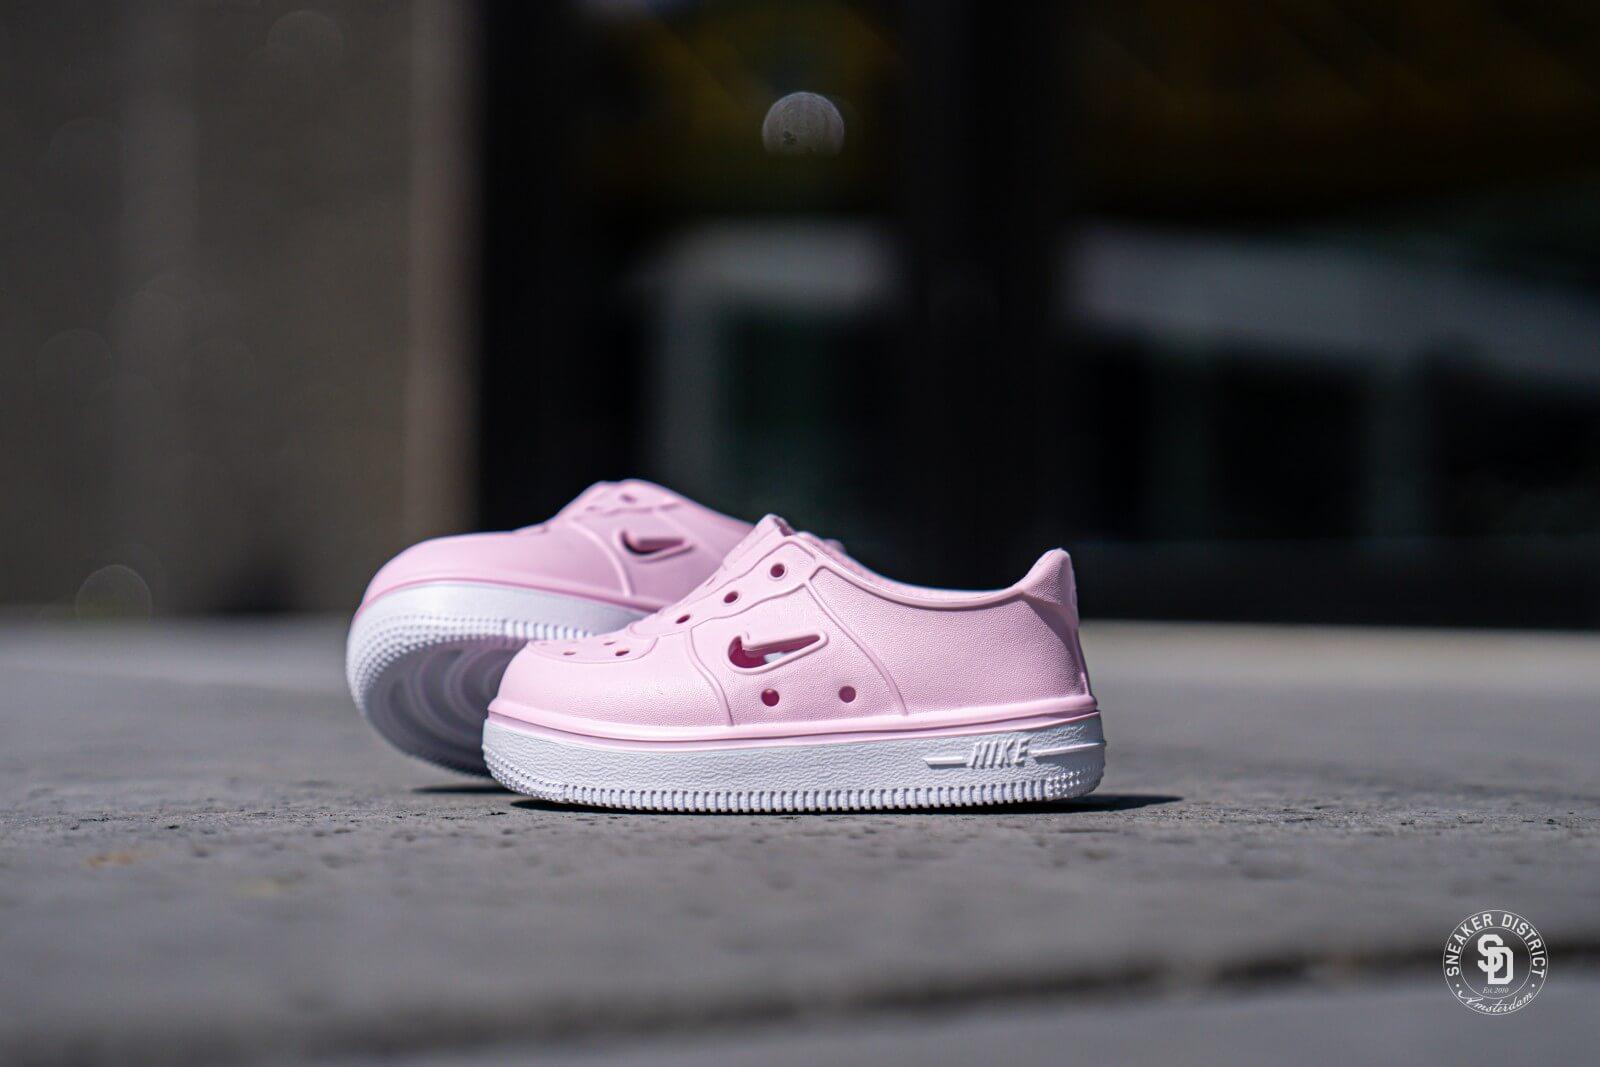 Nike Foam Force 1 TD Pink FoamWhite AQ2442 600